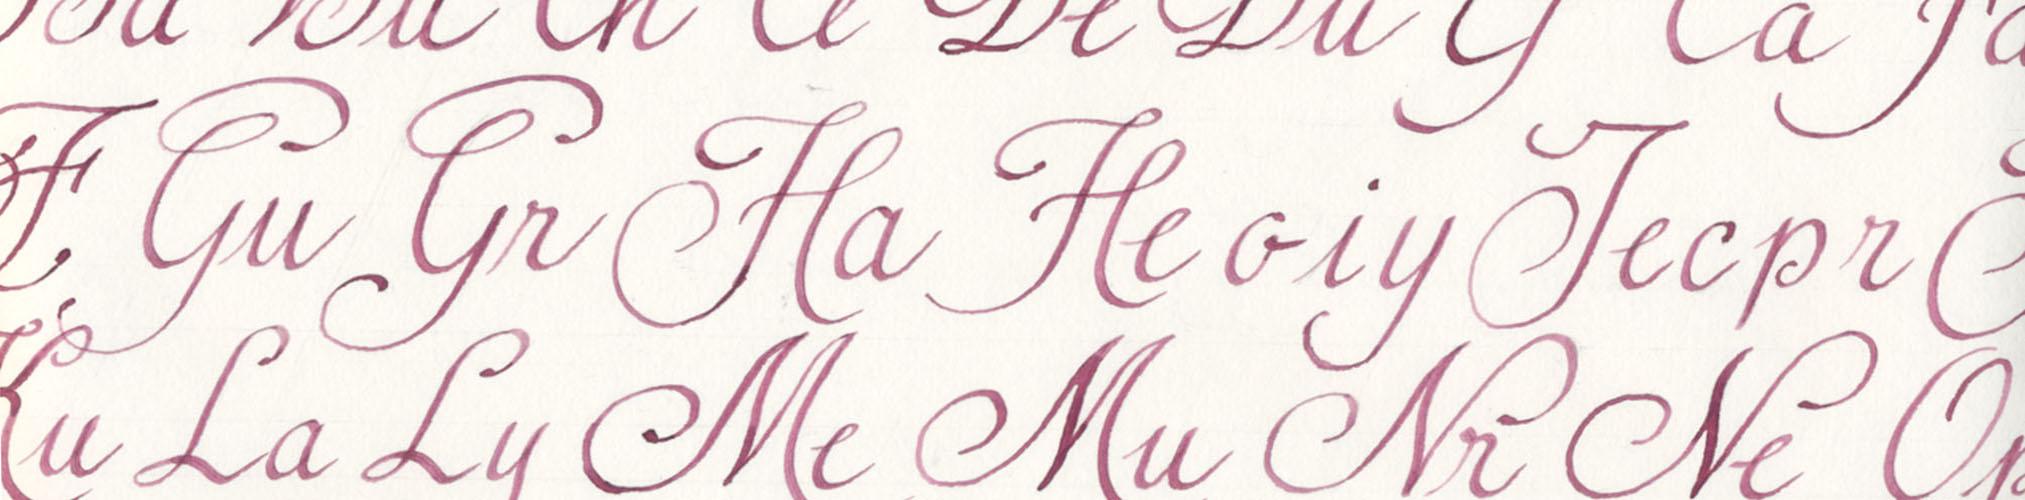 Atelier Elke Eickhoff Kalligraphie lang